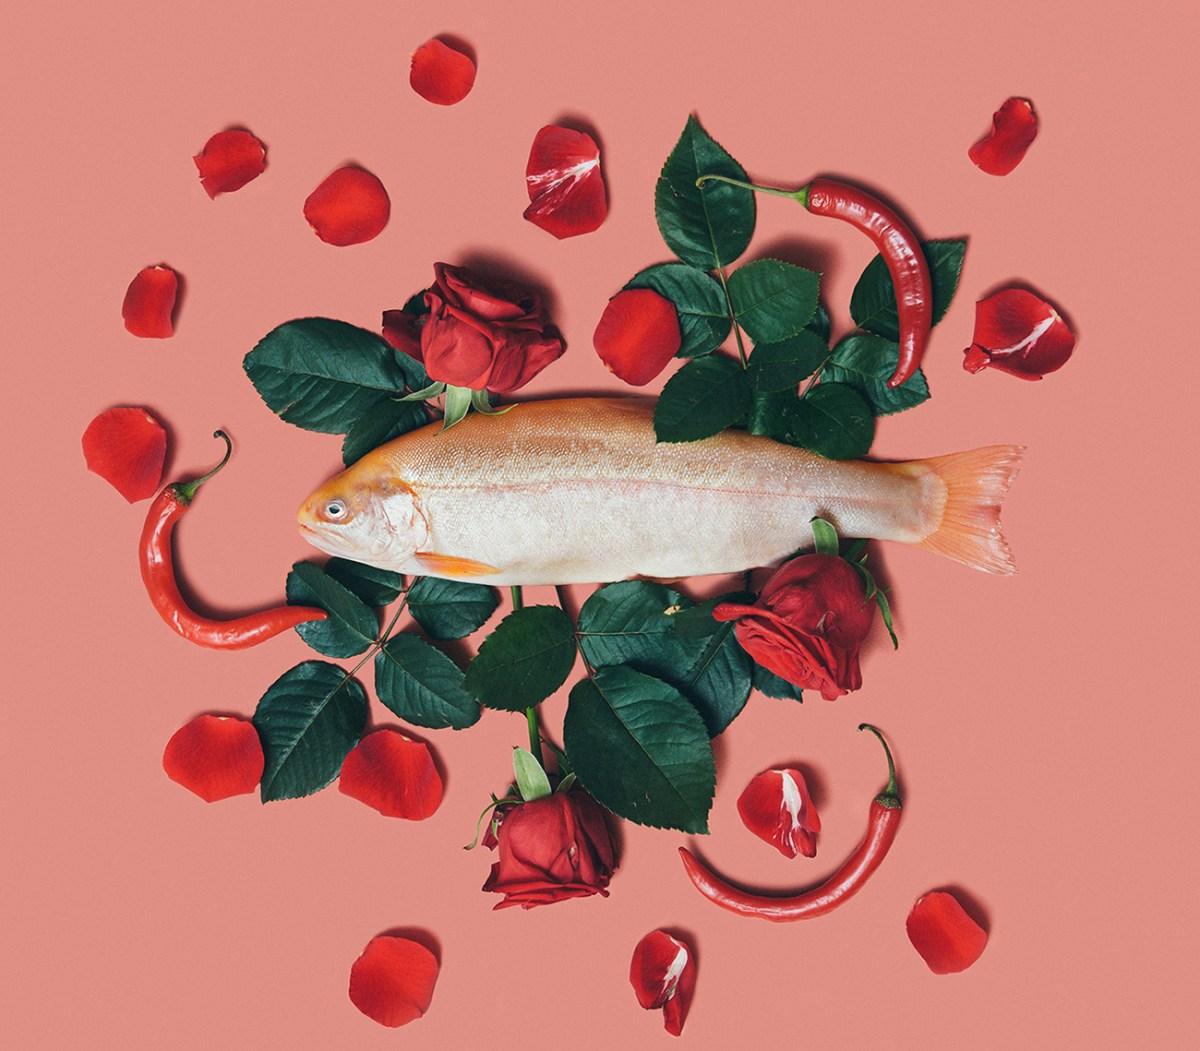 Fish + Flowers